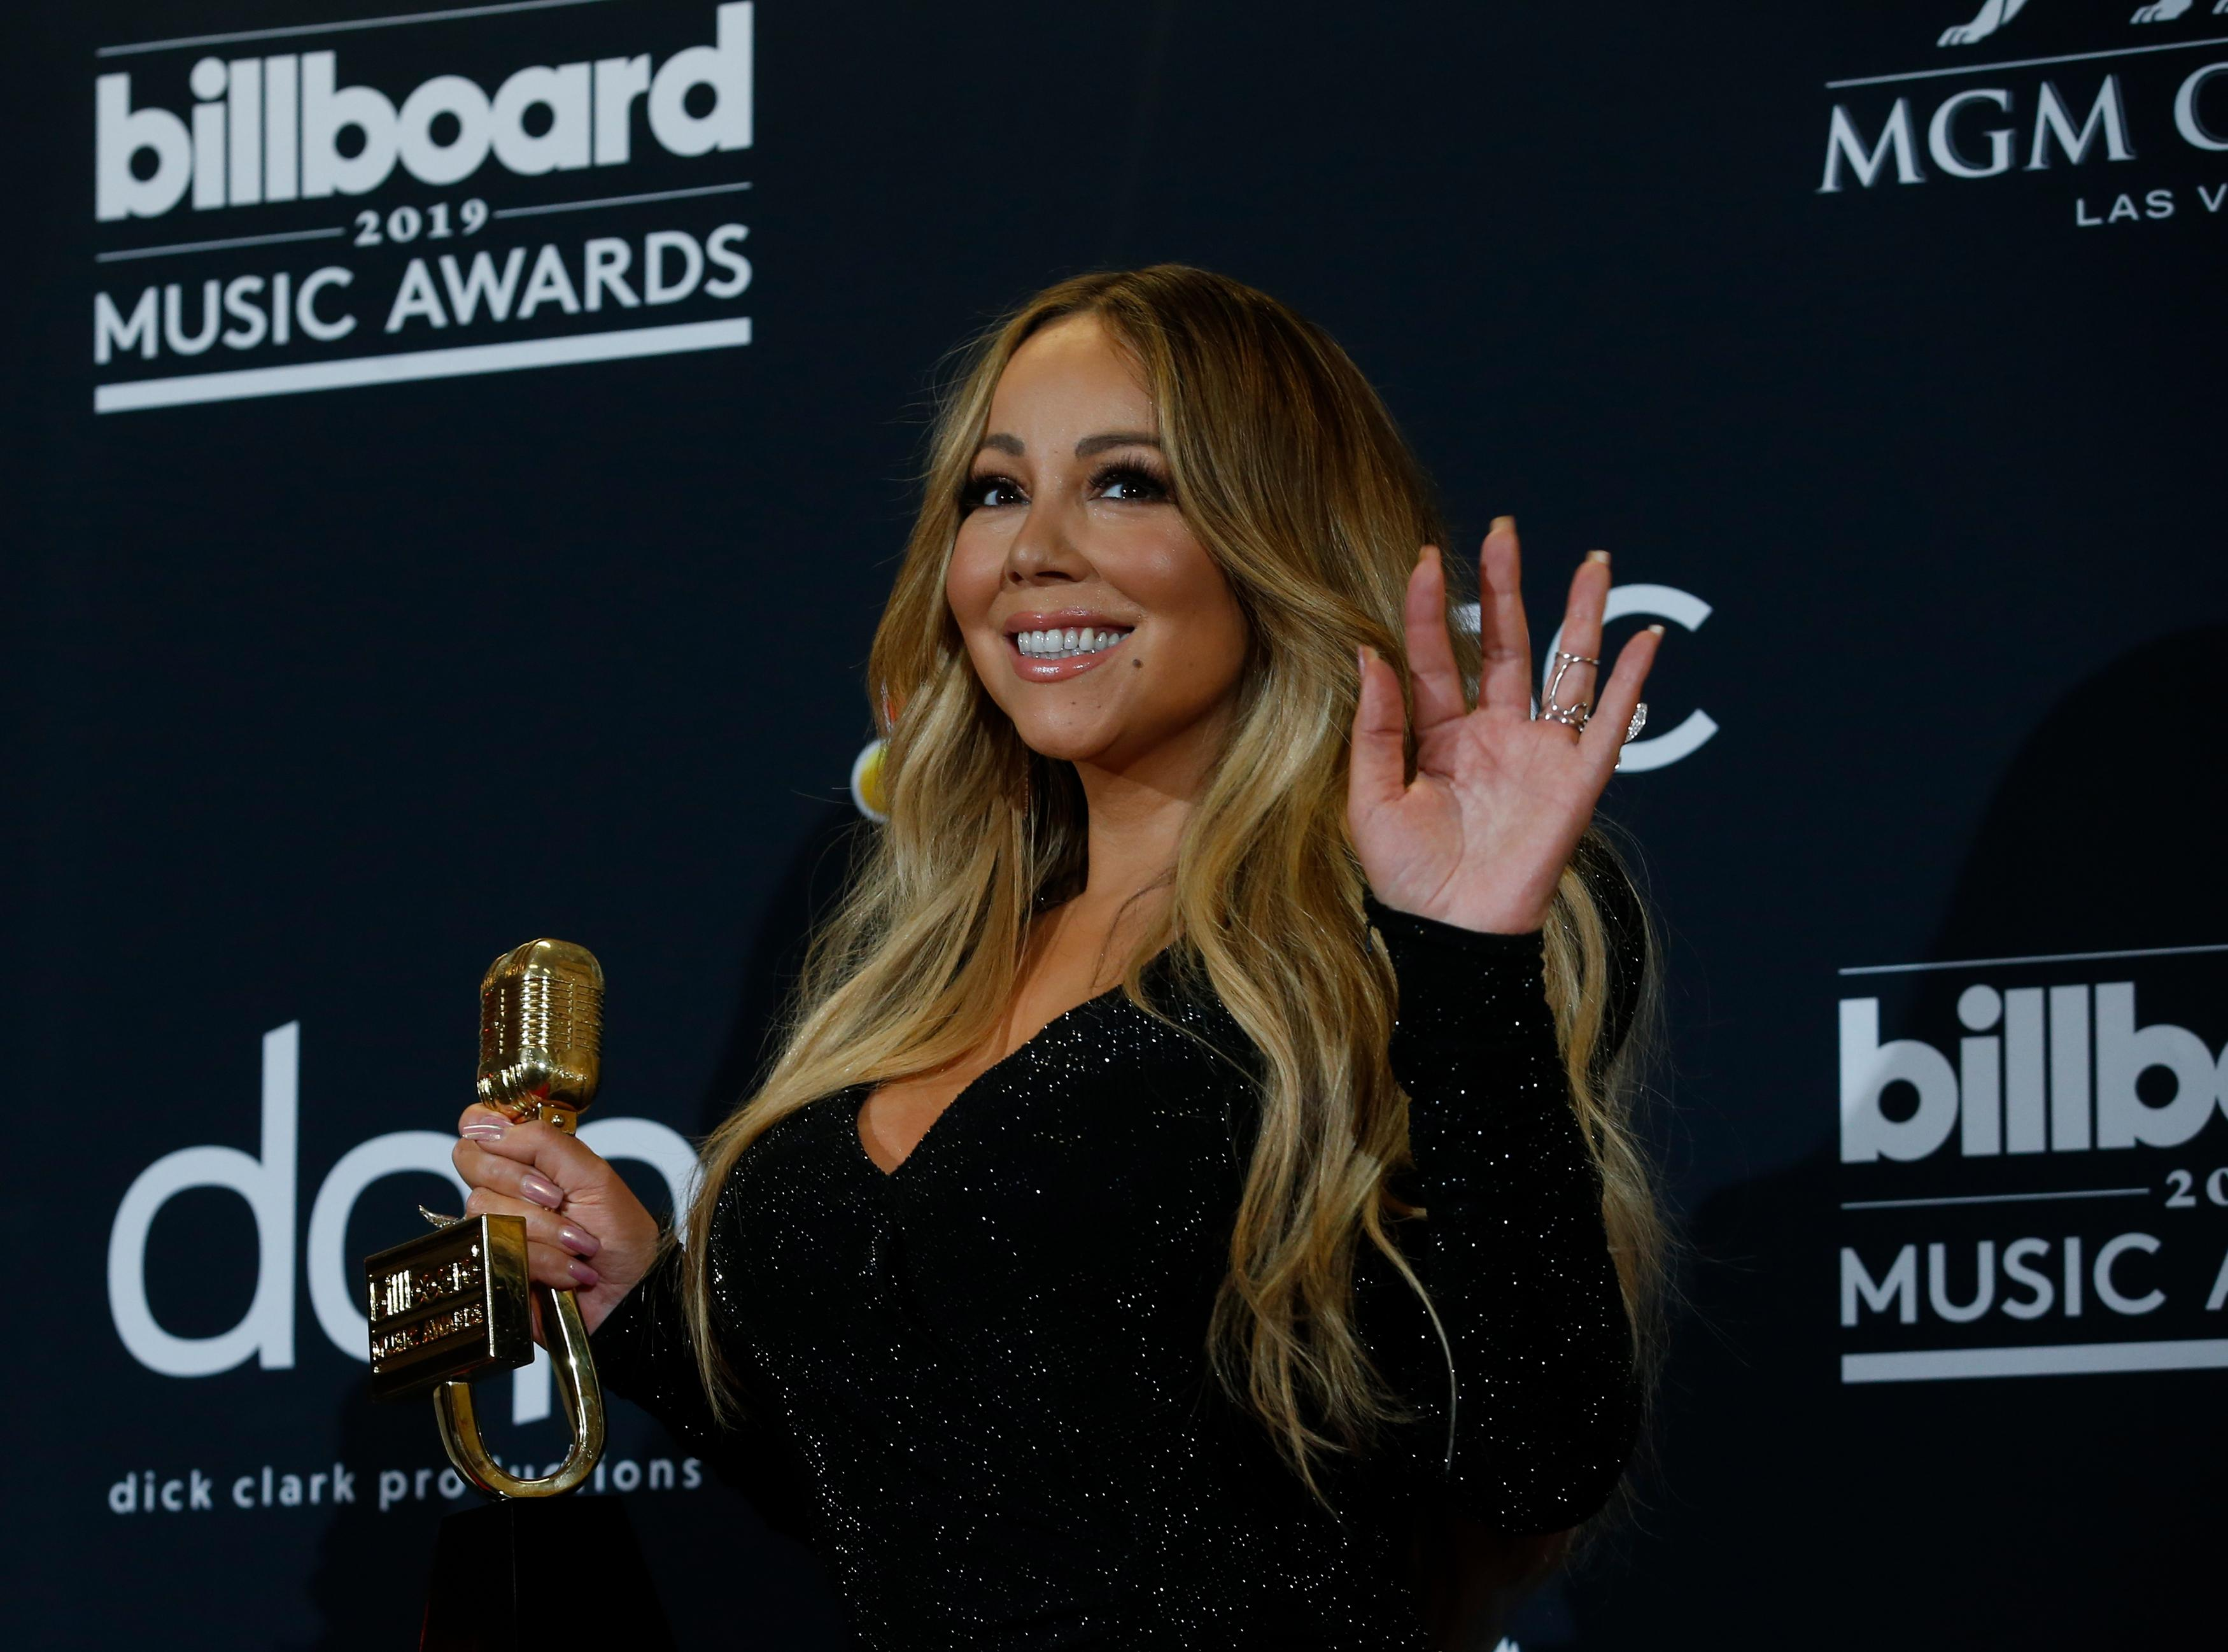 Mariah Carey: Σοκ! Ρατσιστικές και προσβλητικές αναρτήσεις στο twitter της